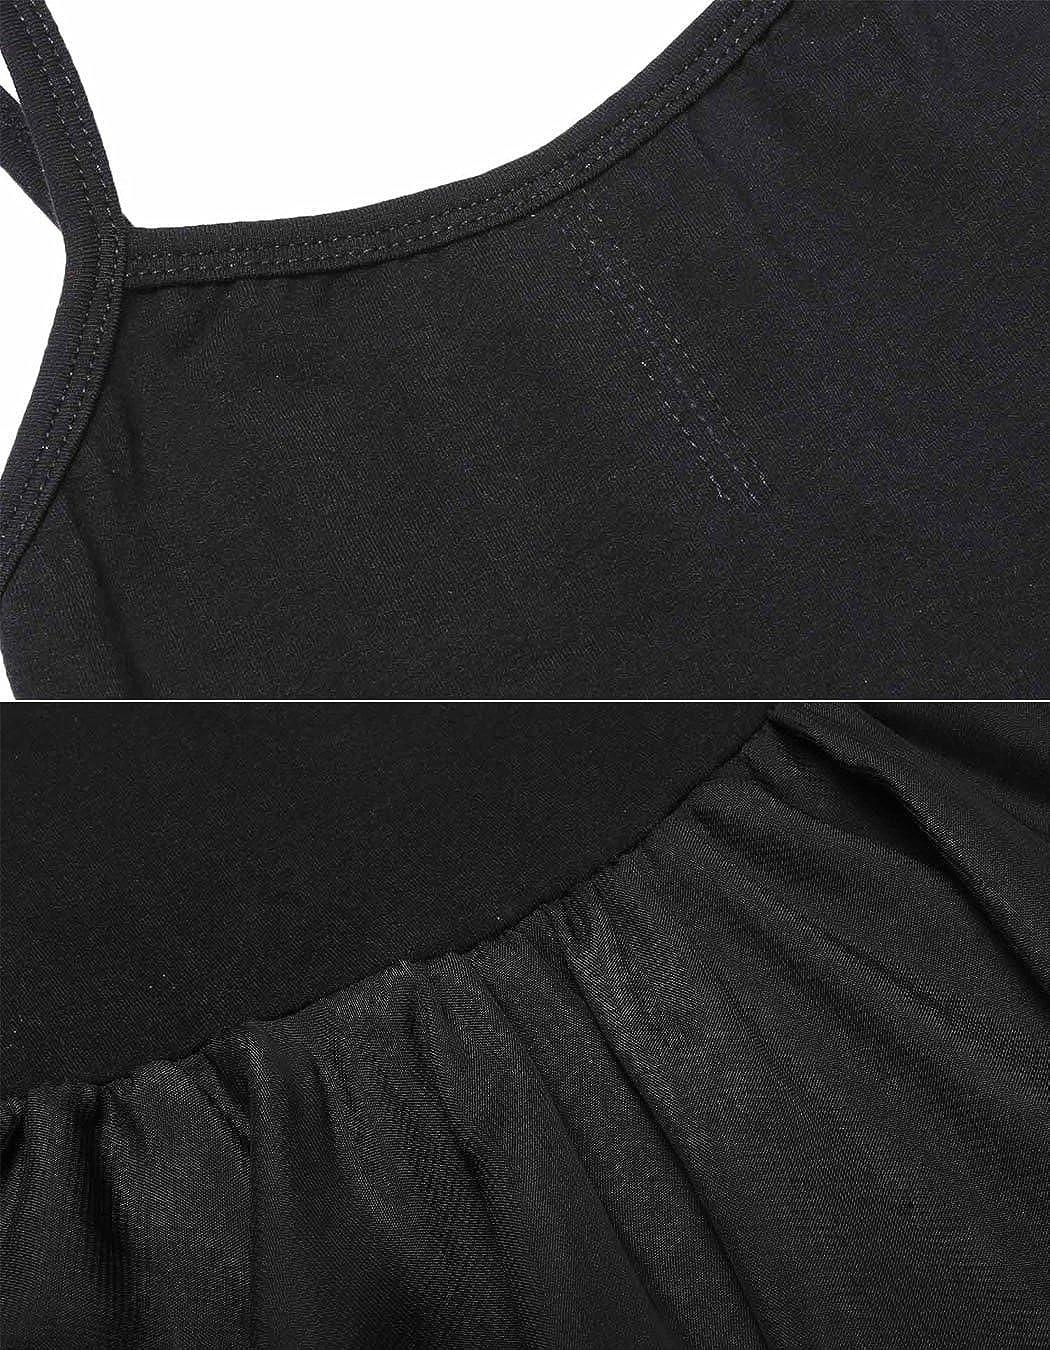 POGT Girls Sleeveless Strappy Dancing Ballet Camisole Dress Leotard skirt